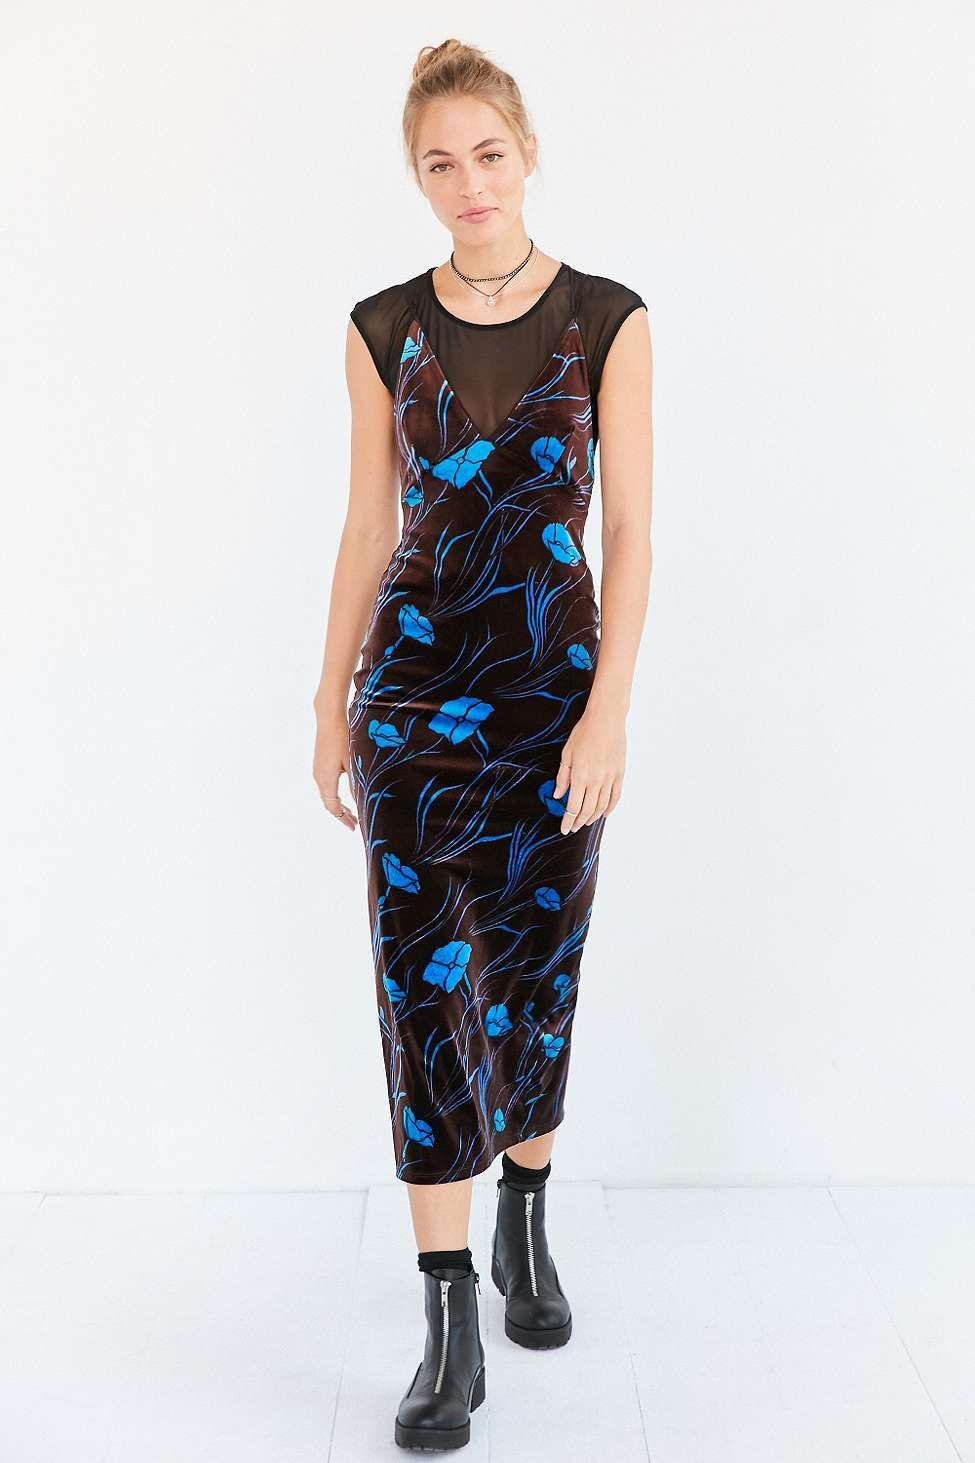 Ecote Bellatrix Floral Blue Velvet Bodycon Midi Dress - Urban Outfitters